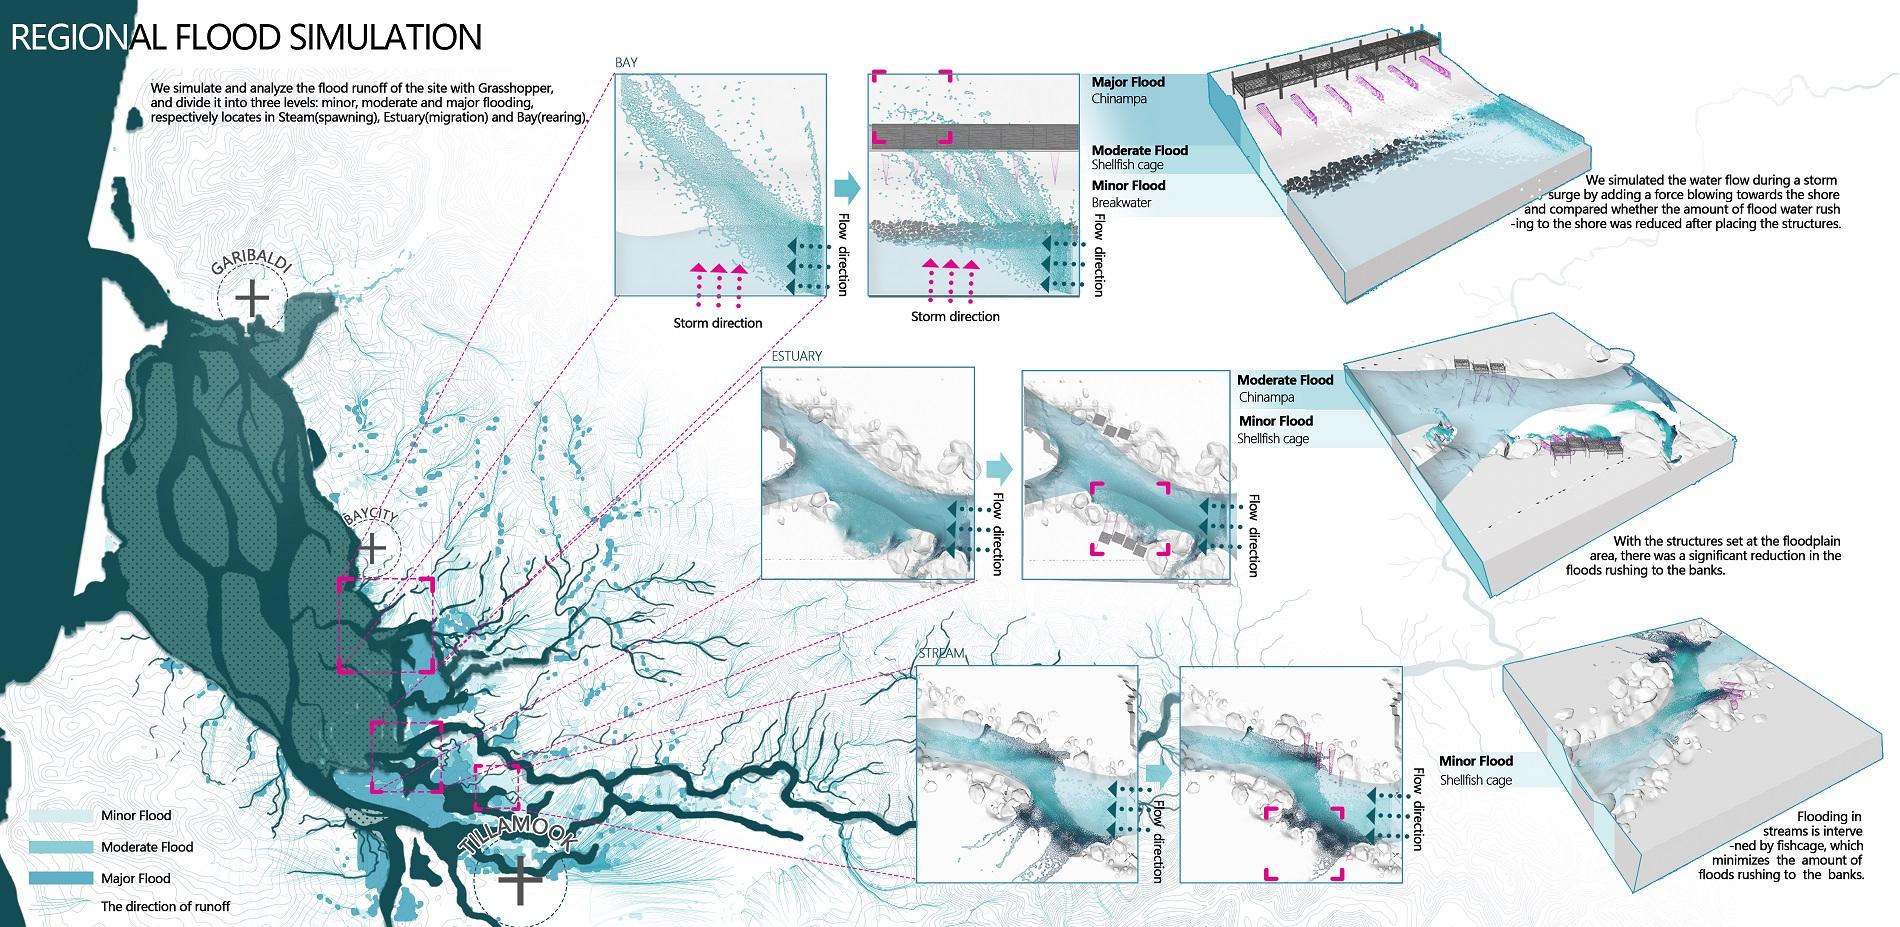 Regional Flood Simulation